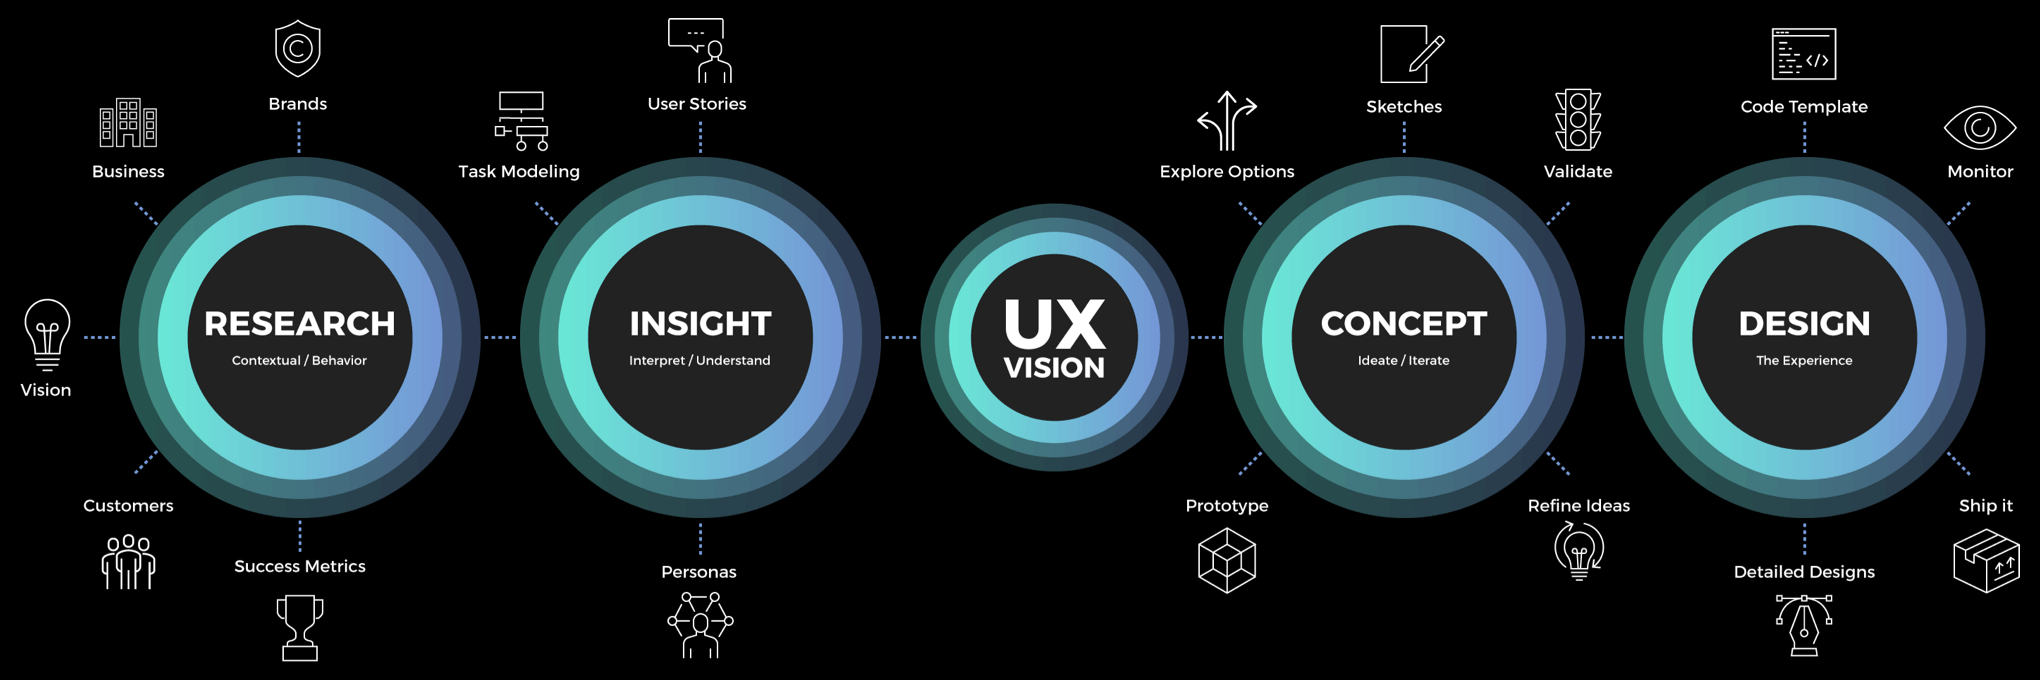 UX Vision